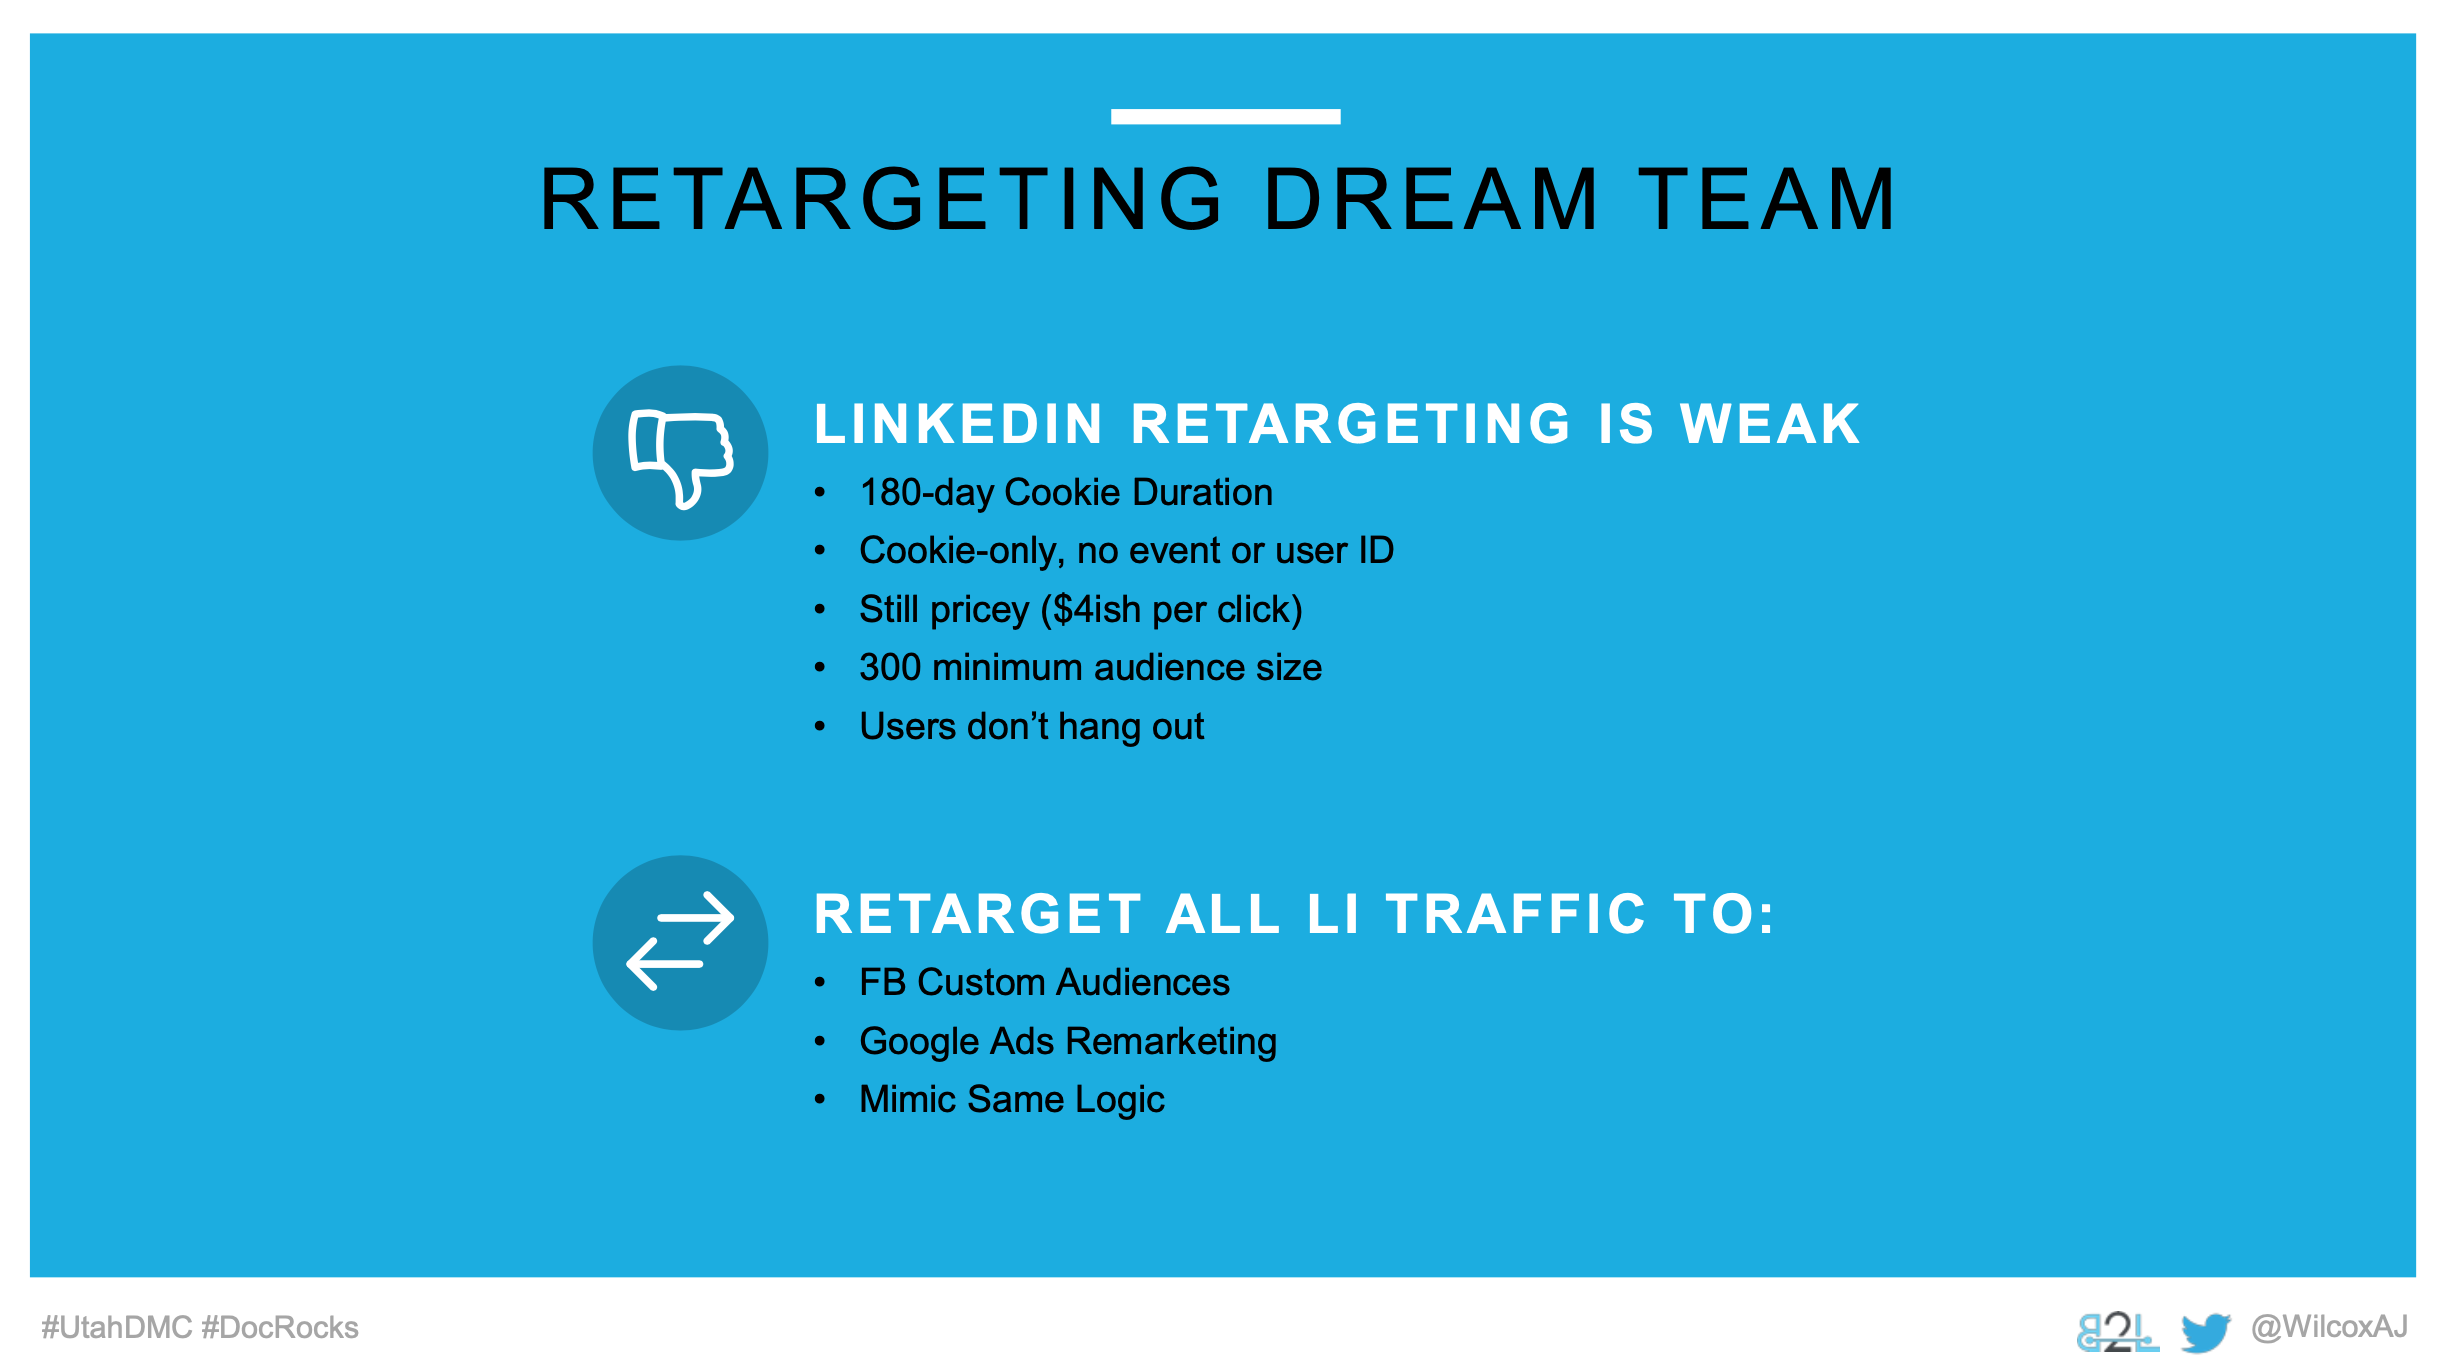 Utah DMC LinkedIn Ads - Aj Wilcox - Ad Units - Retatgeting Dream Team